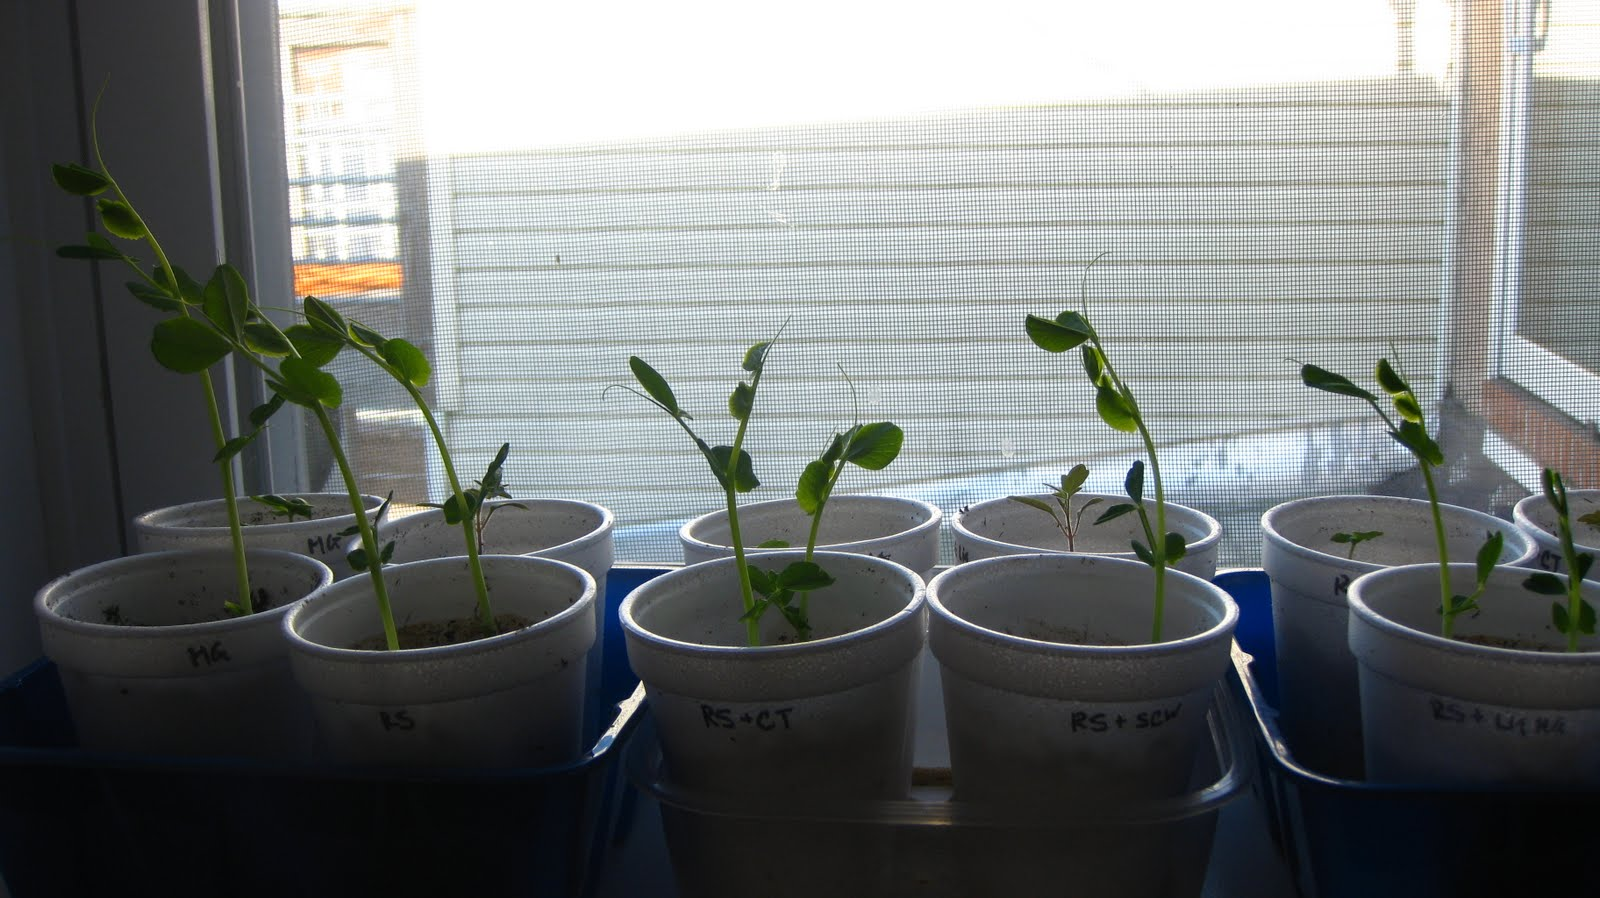 Charm City Balcony Garden Fertilizer Experiment Update